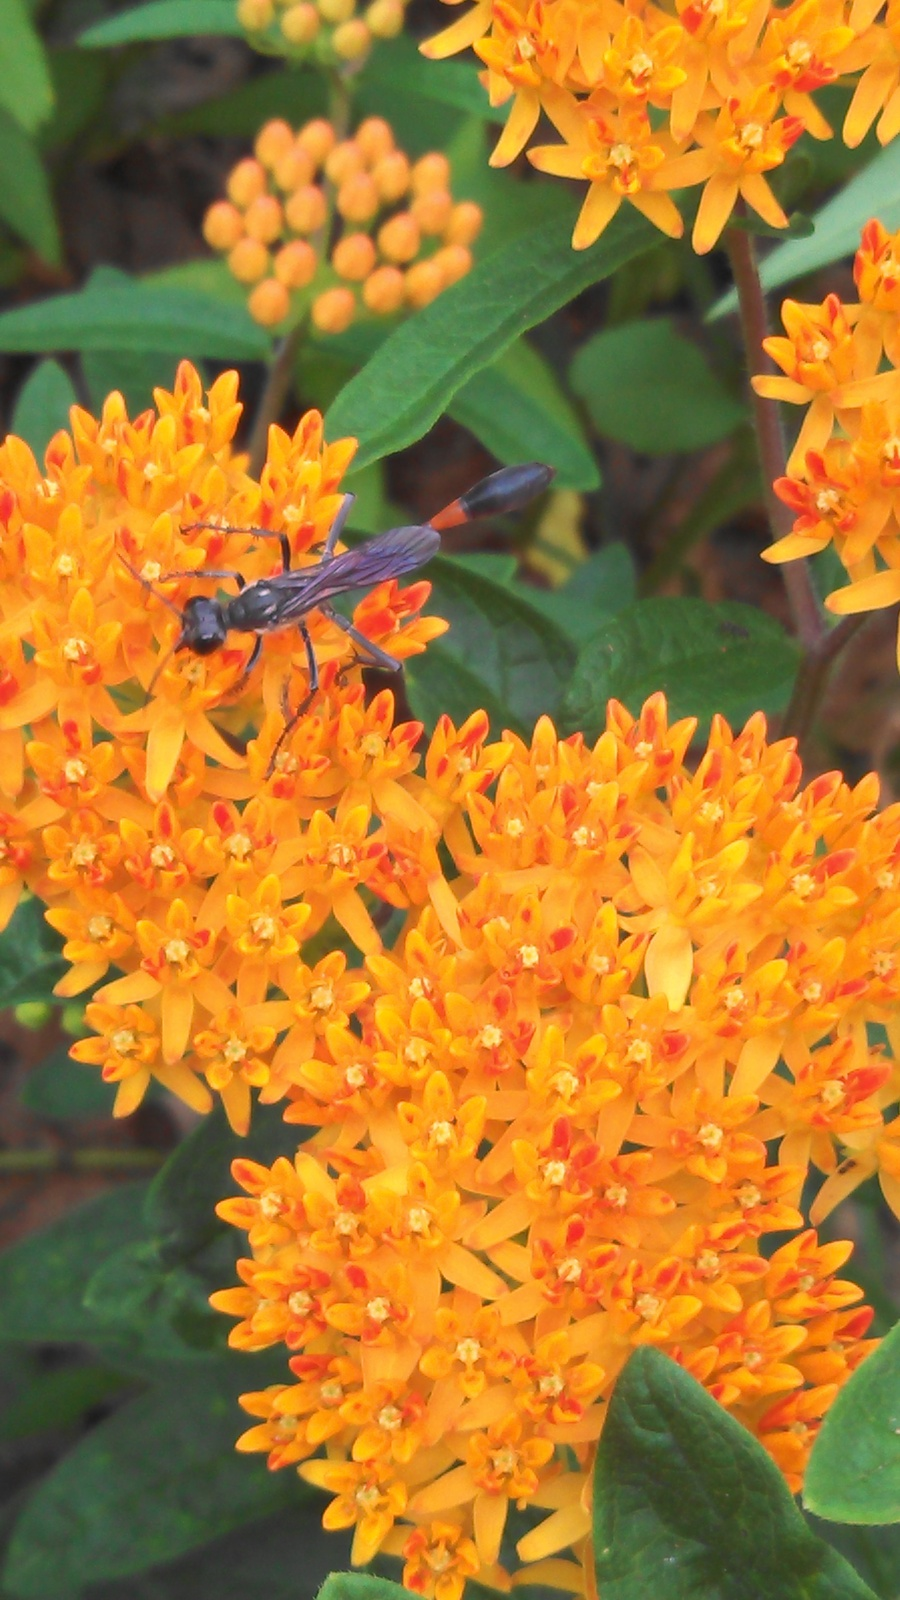 Organically grown Butterflyweed,Asclepias tuberosa, Milkweed Monarch butterflies